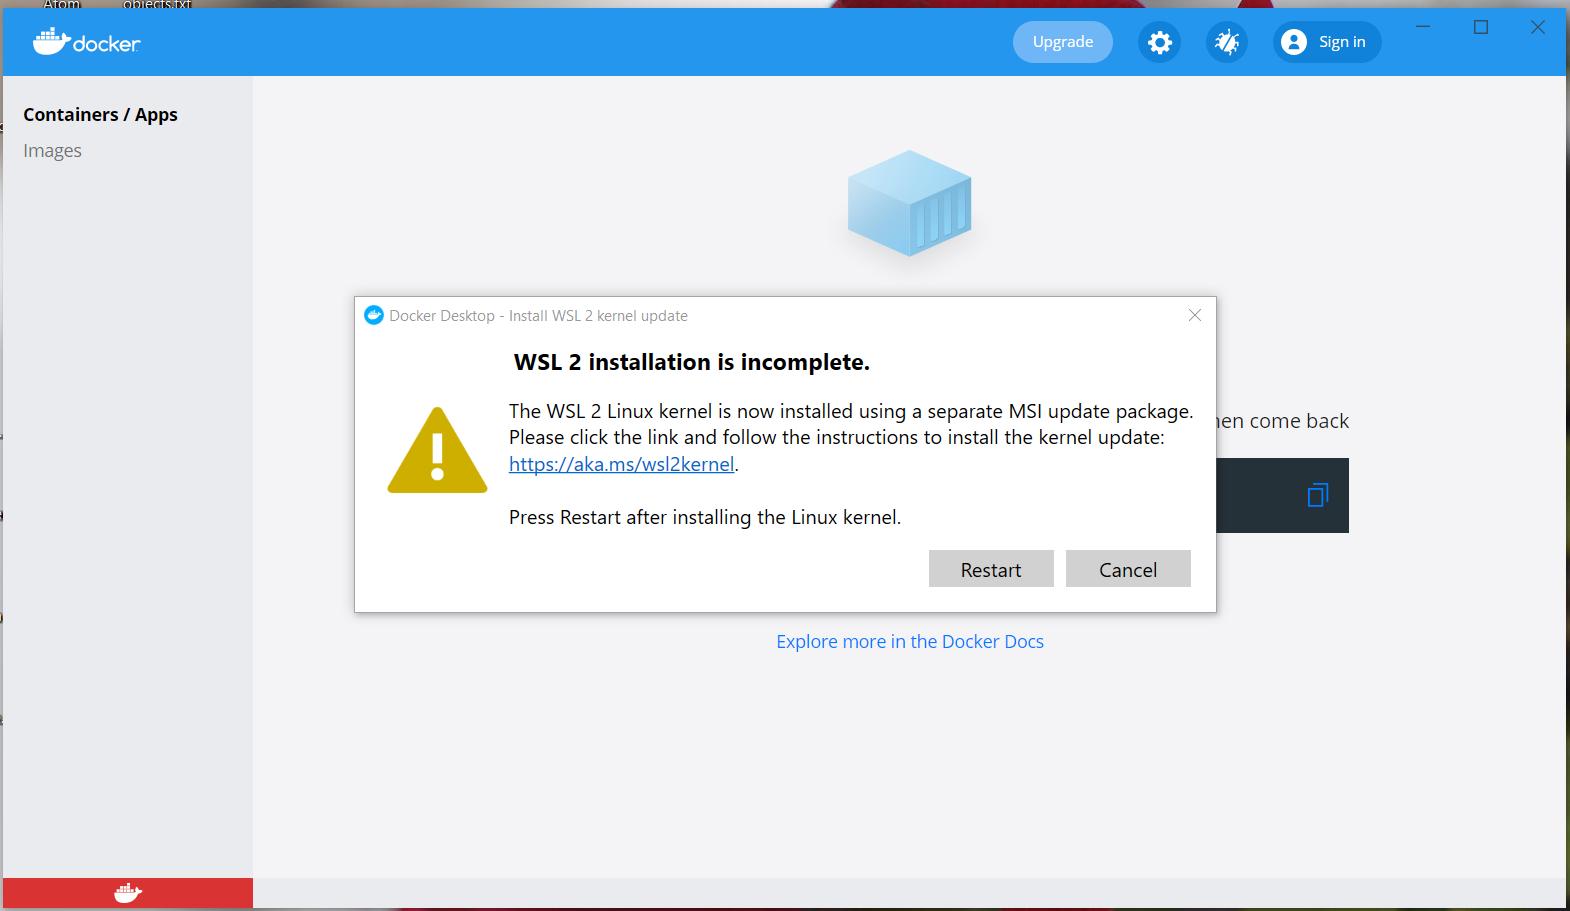 Install Docker Desktop on Windows 10 - WSL Update